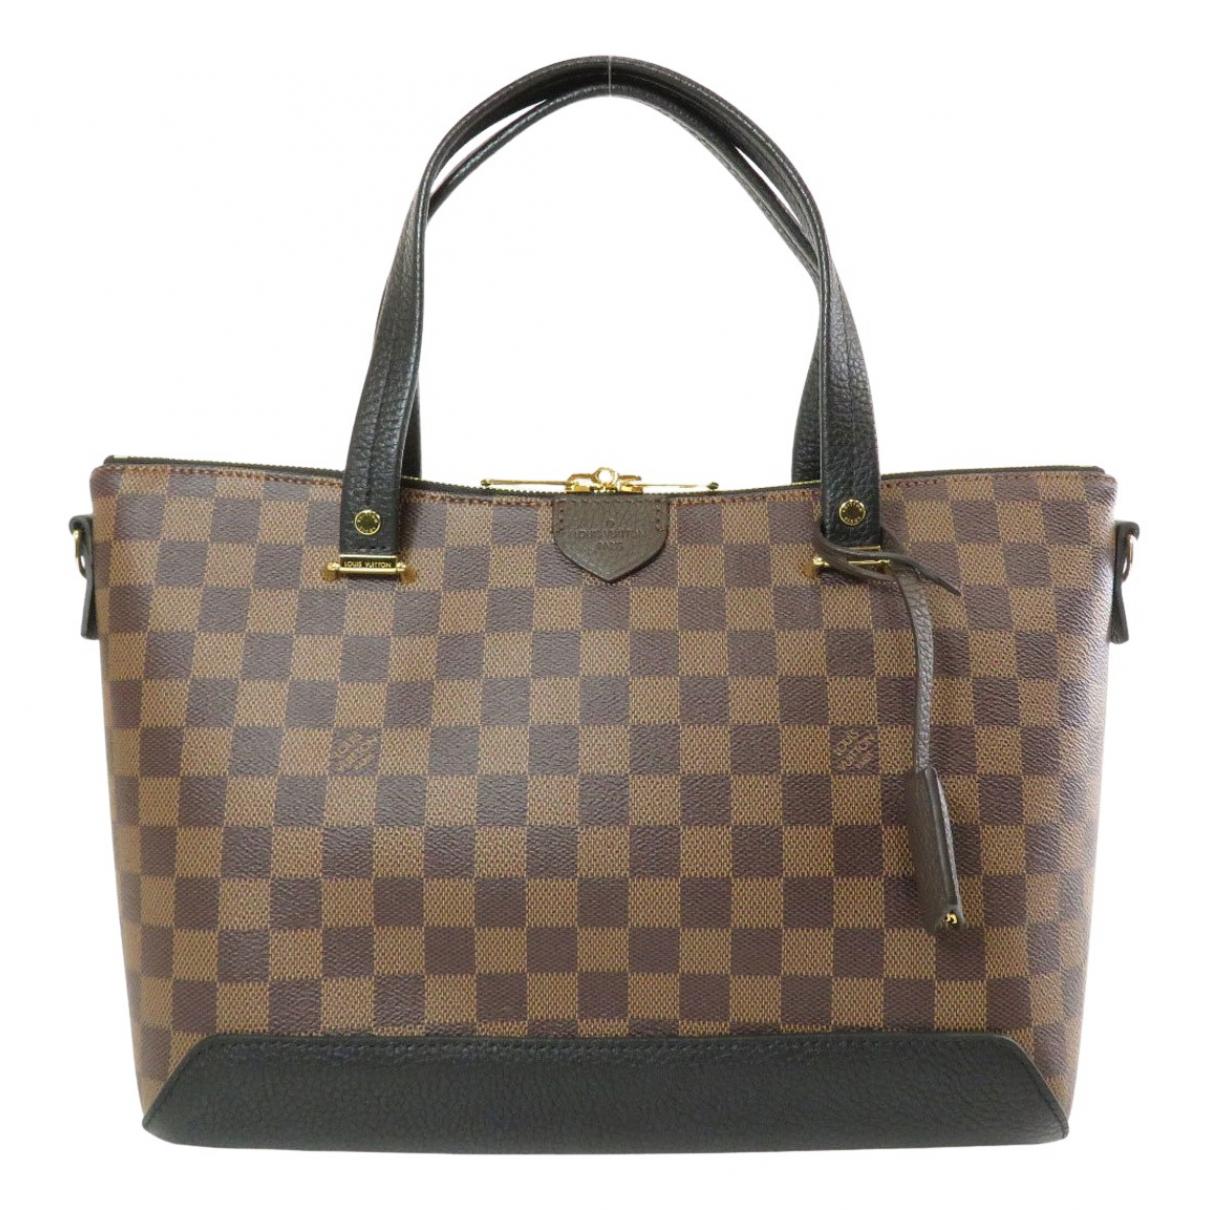 Louis Vuitton Hyde Park Handtasche in  Braun Leinen